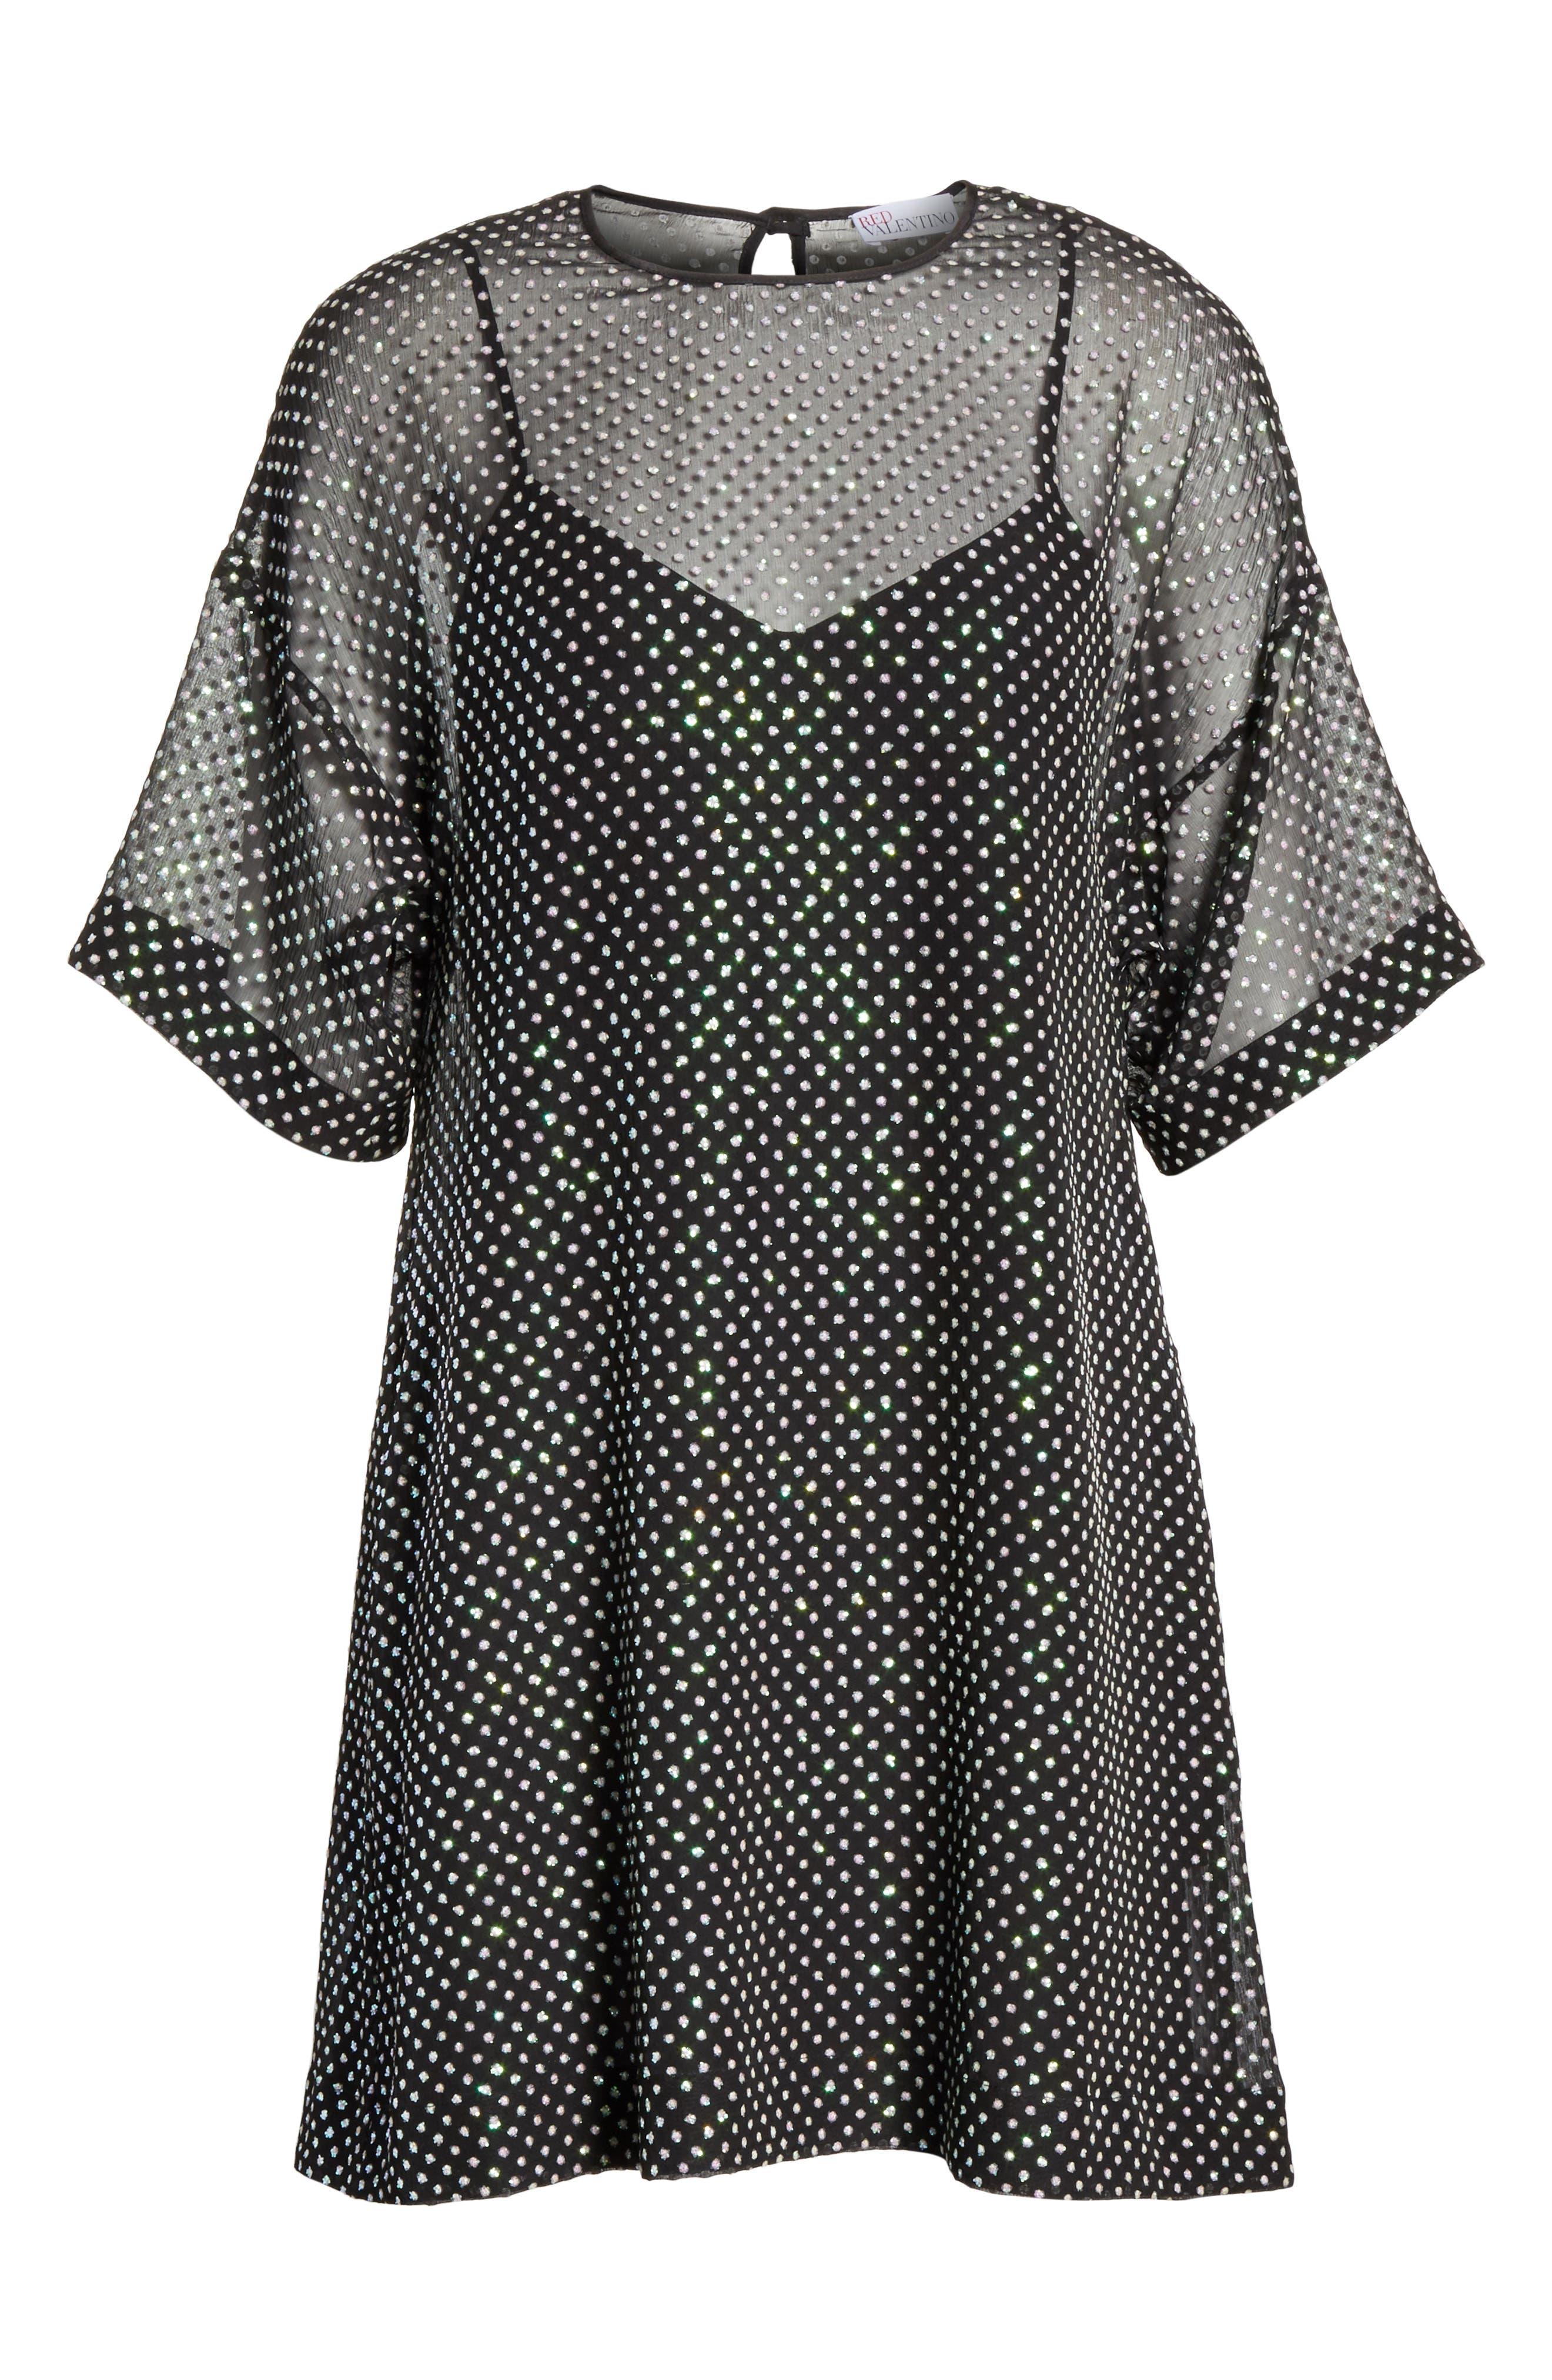 Creponne T-Shirt Dress,                             Alternate thumbnail 6, color,                             Black